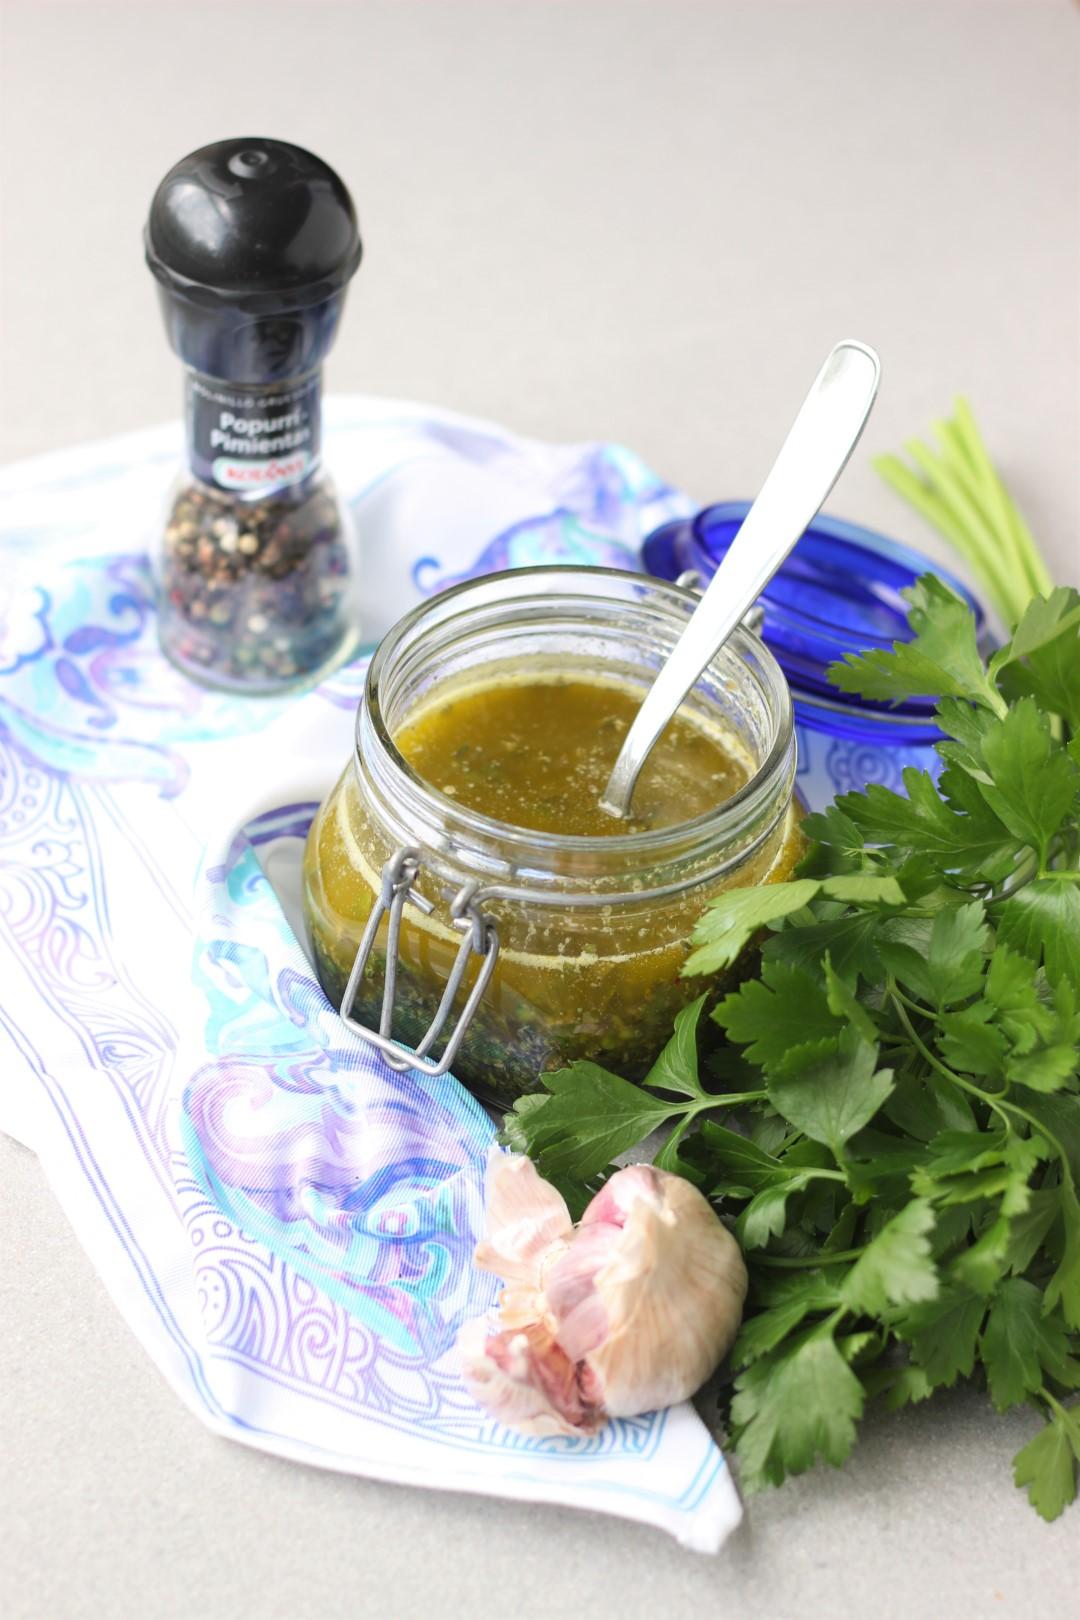 salsa chimichurri, como hacer chimichurri, receta de chimichurri, recetas de cocina, argentina, uruguay, recetas para asado, kotanyi.